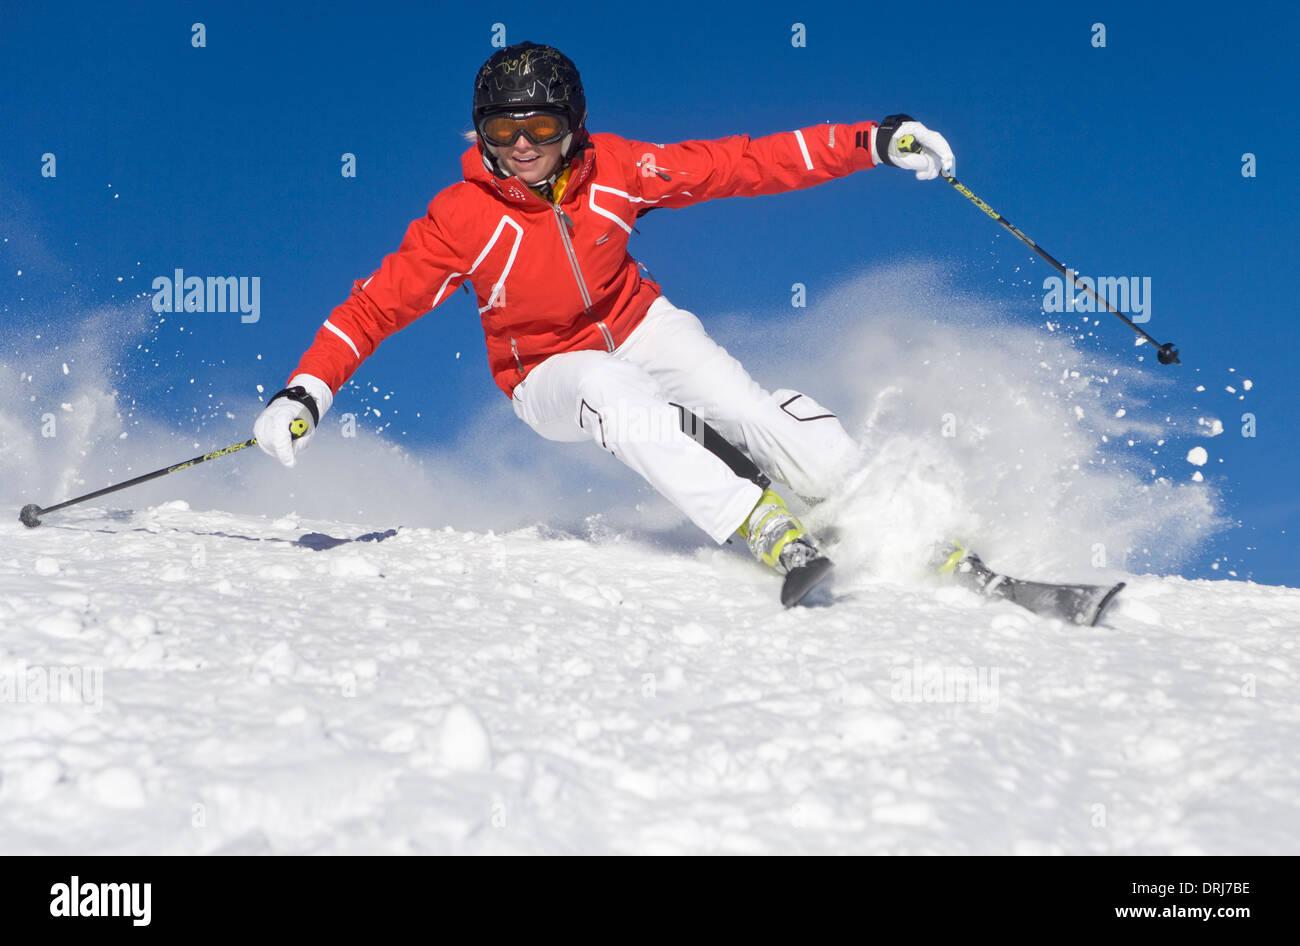 Carving ski stock photos images alamy